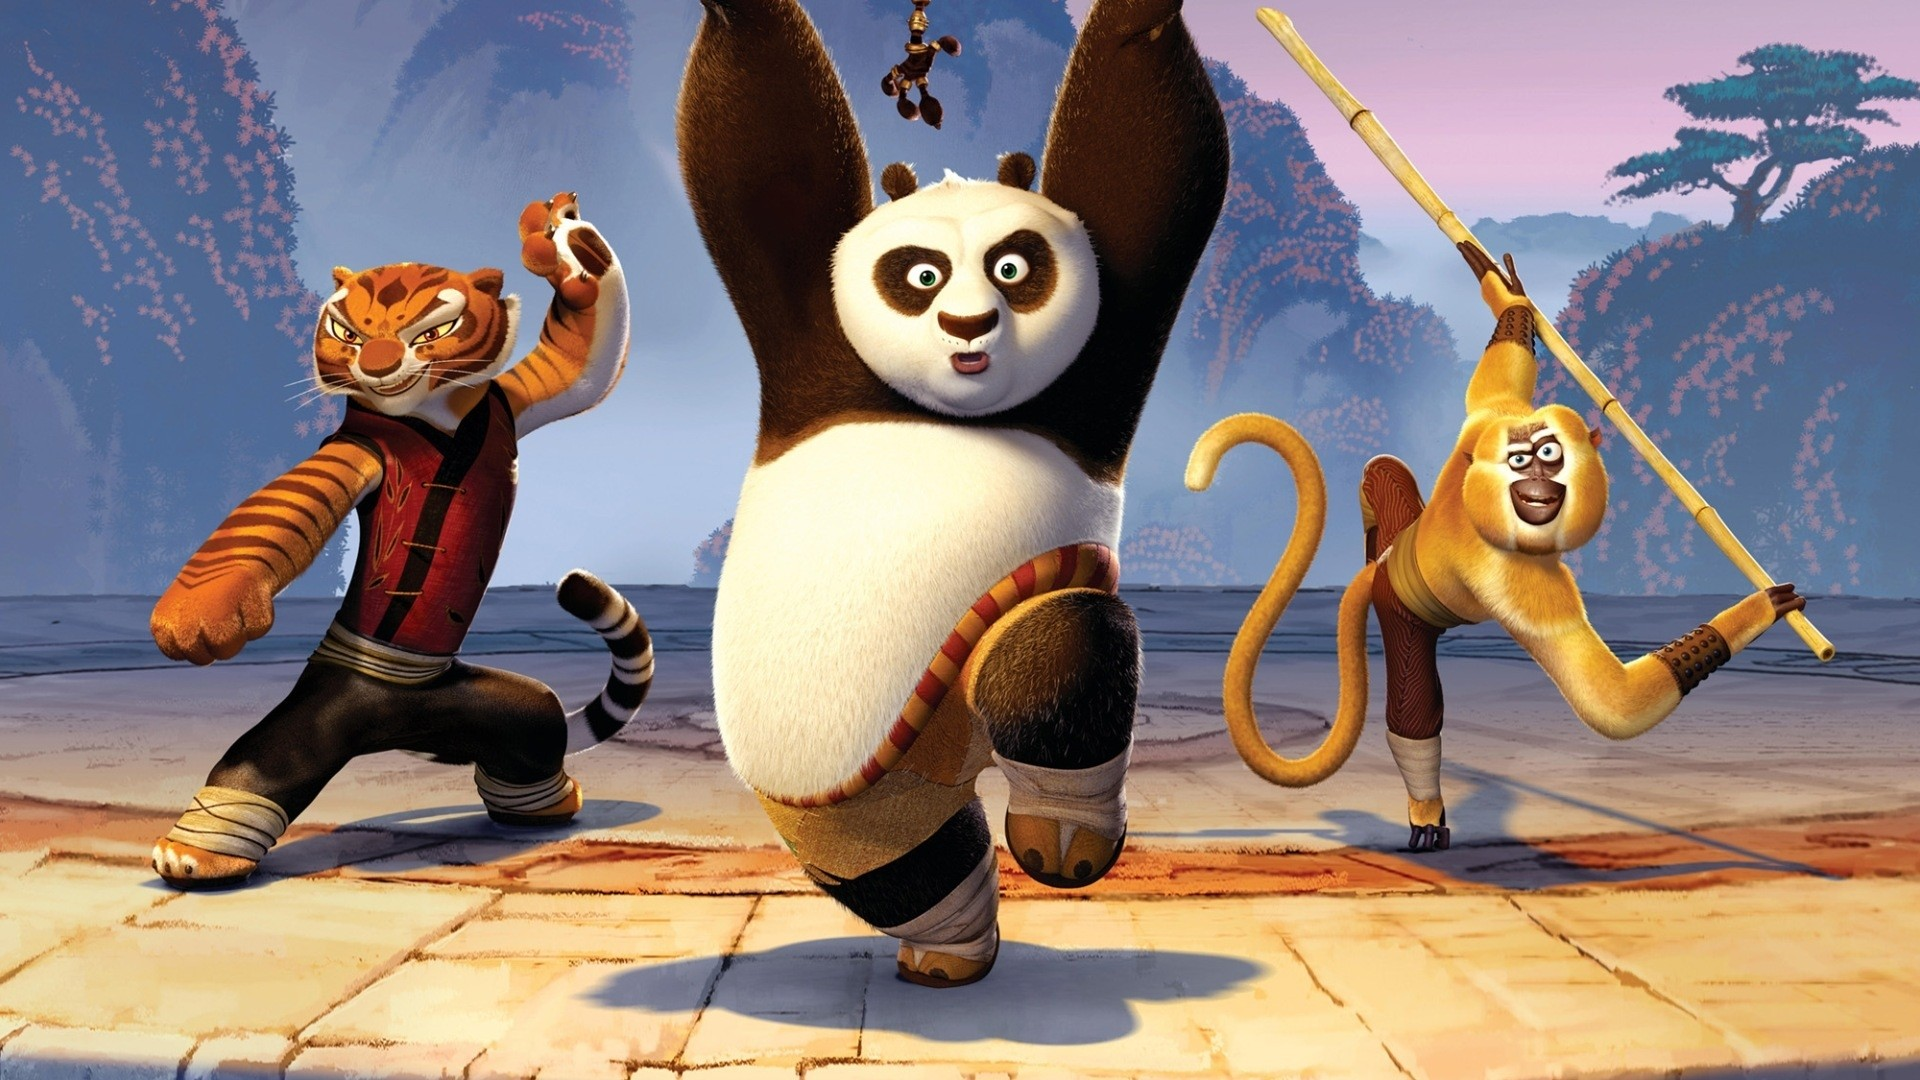 Kung Fu Panda Wallpaper